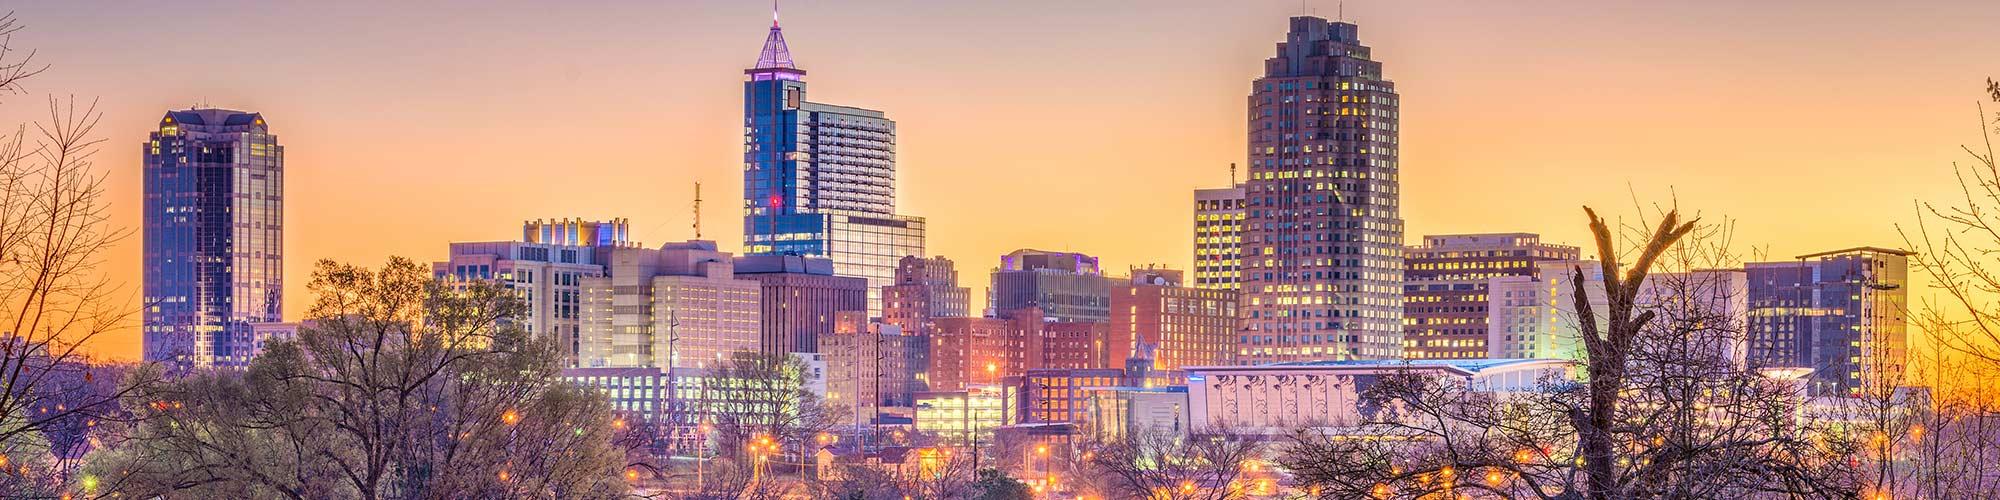 Raleigh Skyline Header Image